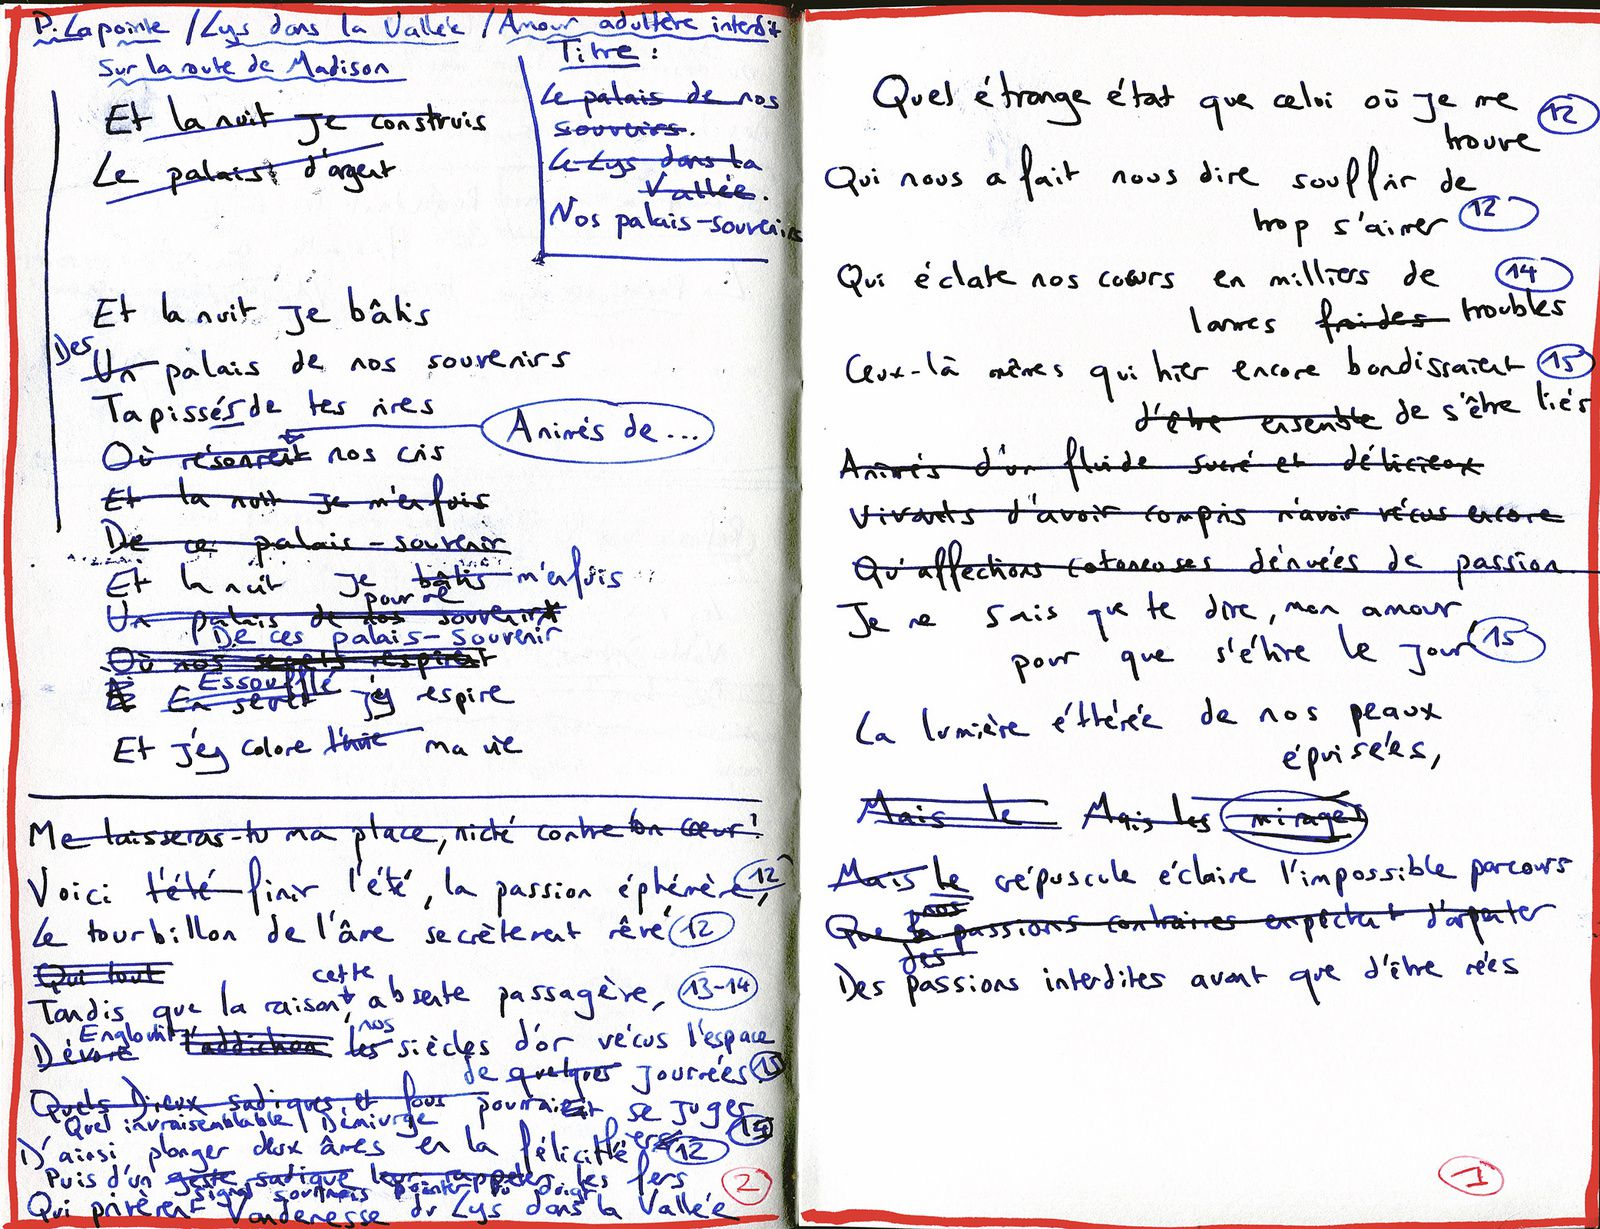 Nos palais-souvenir (manuscrit)